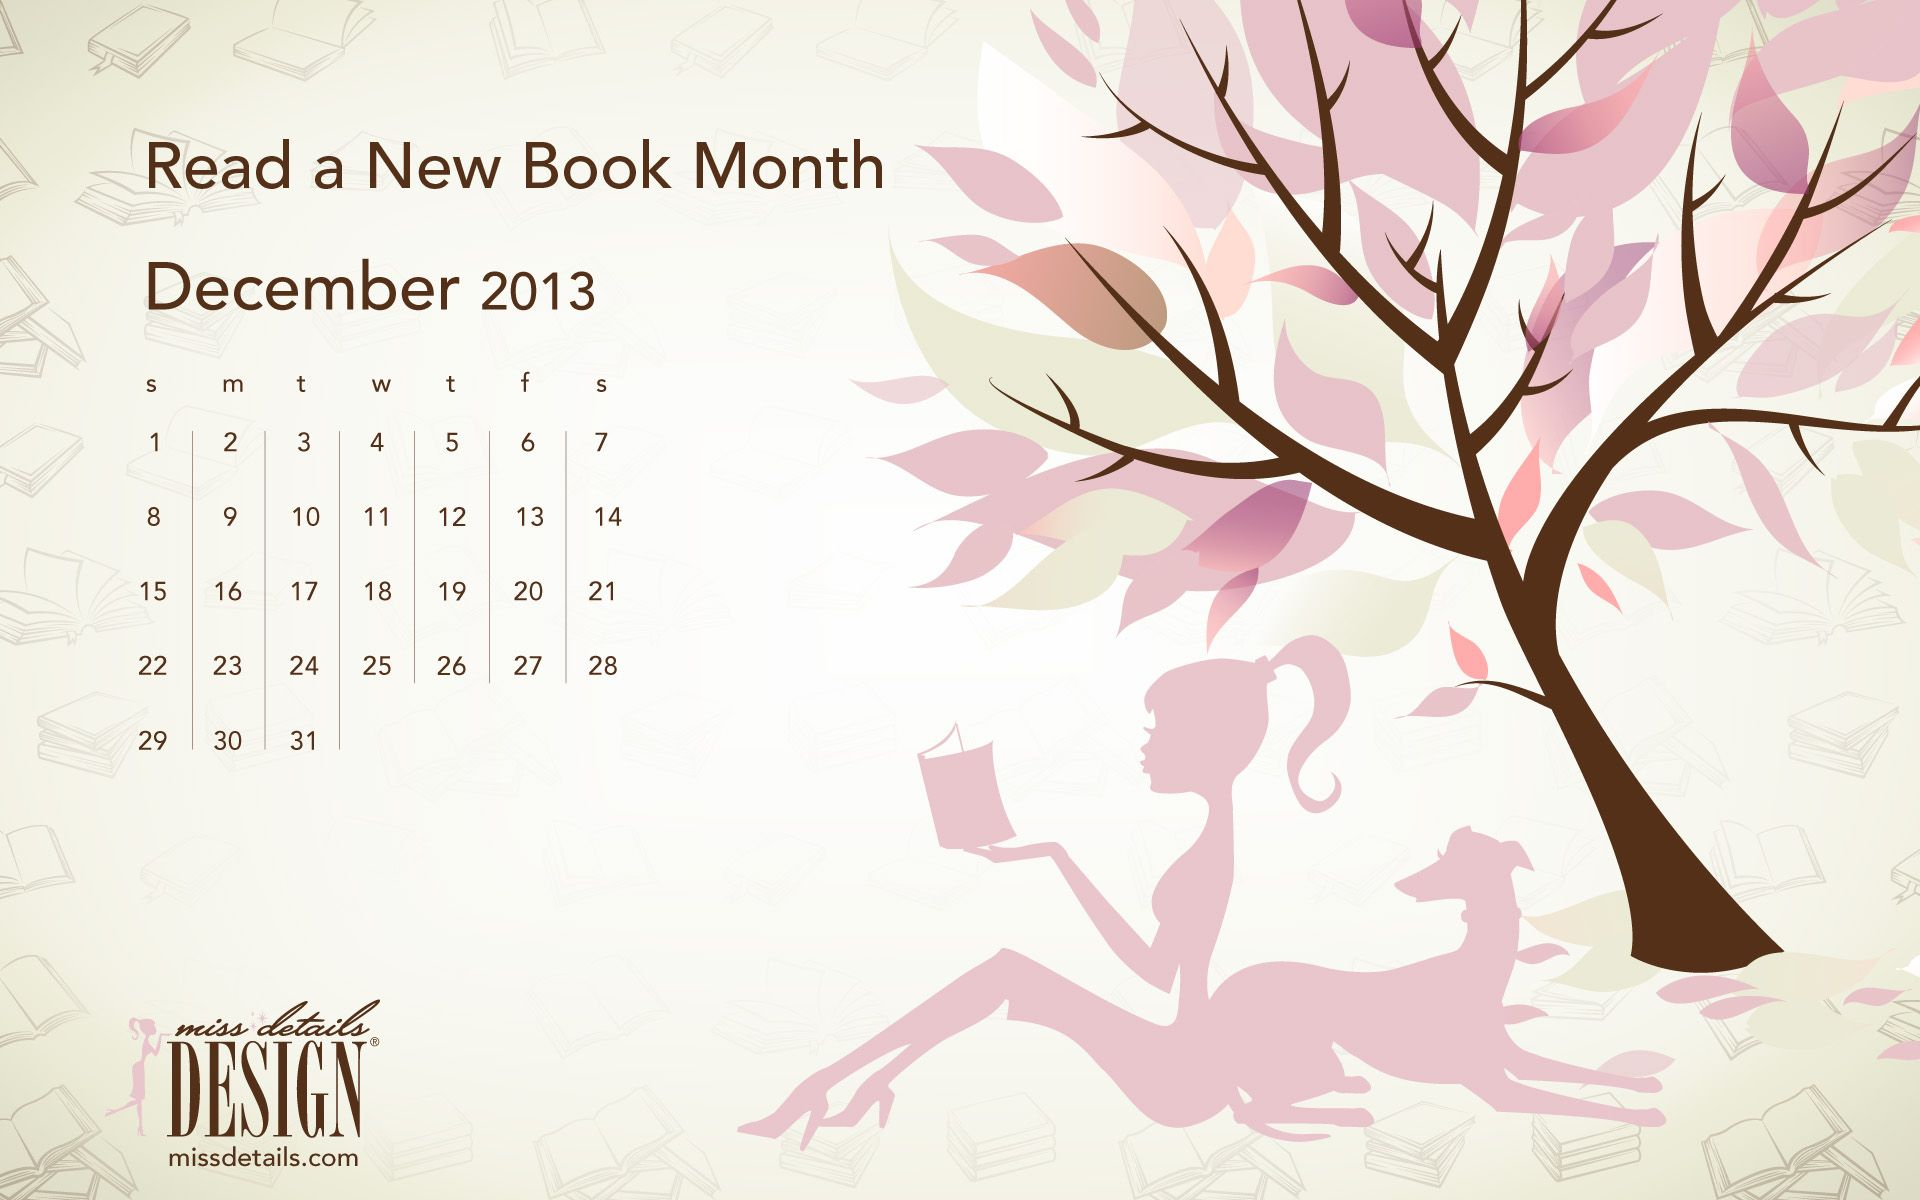 Free inspiring December desktop calendars from missdetails